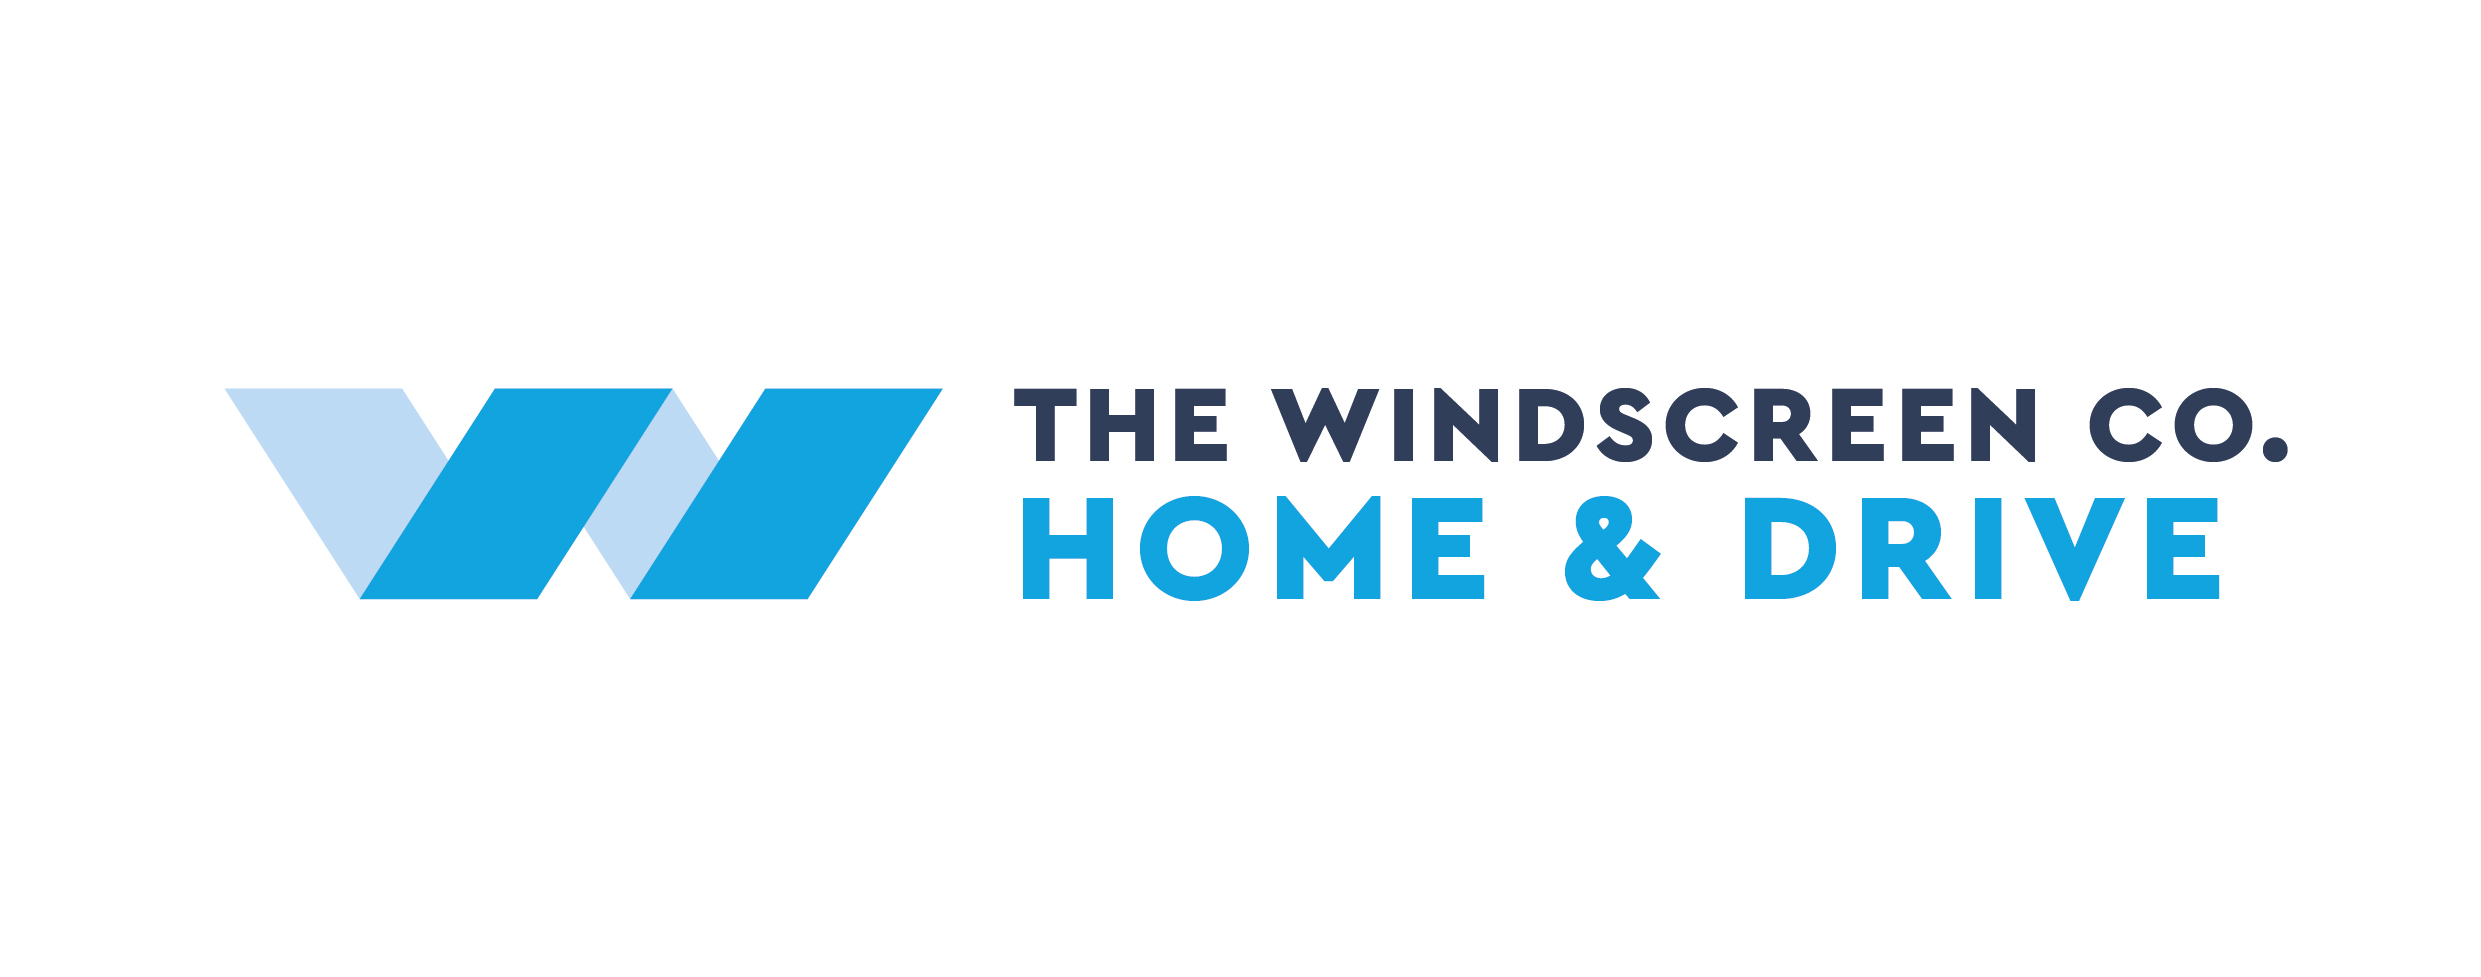 TWC Home & Drive New Logo